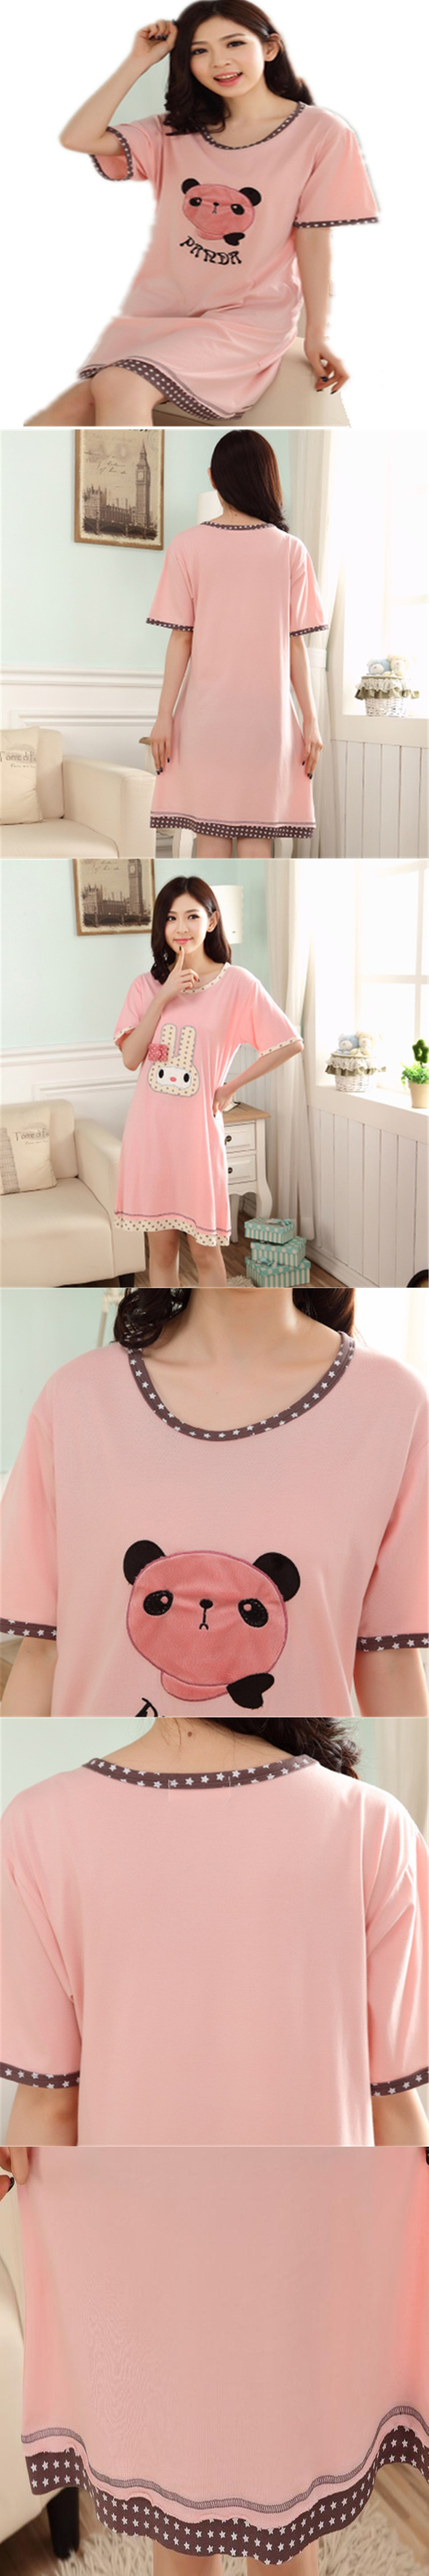 2016 Summer Cotton Sleepwear Nightdress Dress Women Short Sleeve Plus Size Cute Cartoon Summer Homewear Nightgowns LJ3838